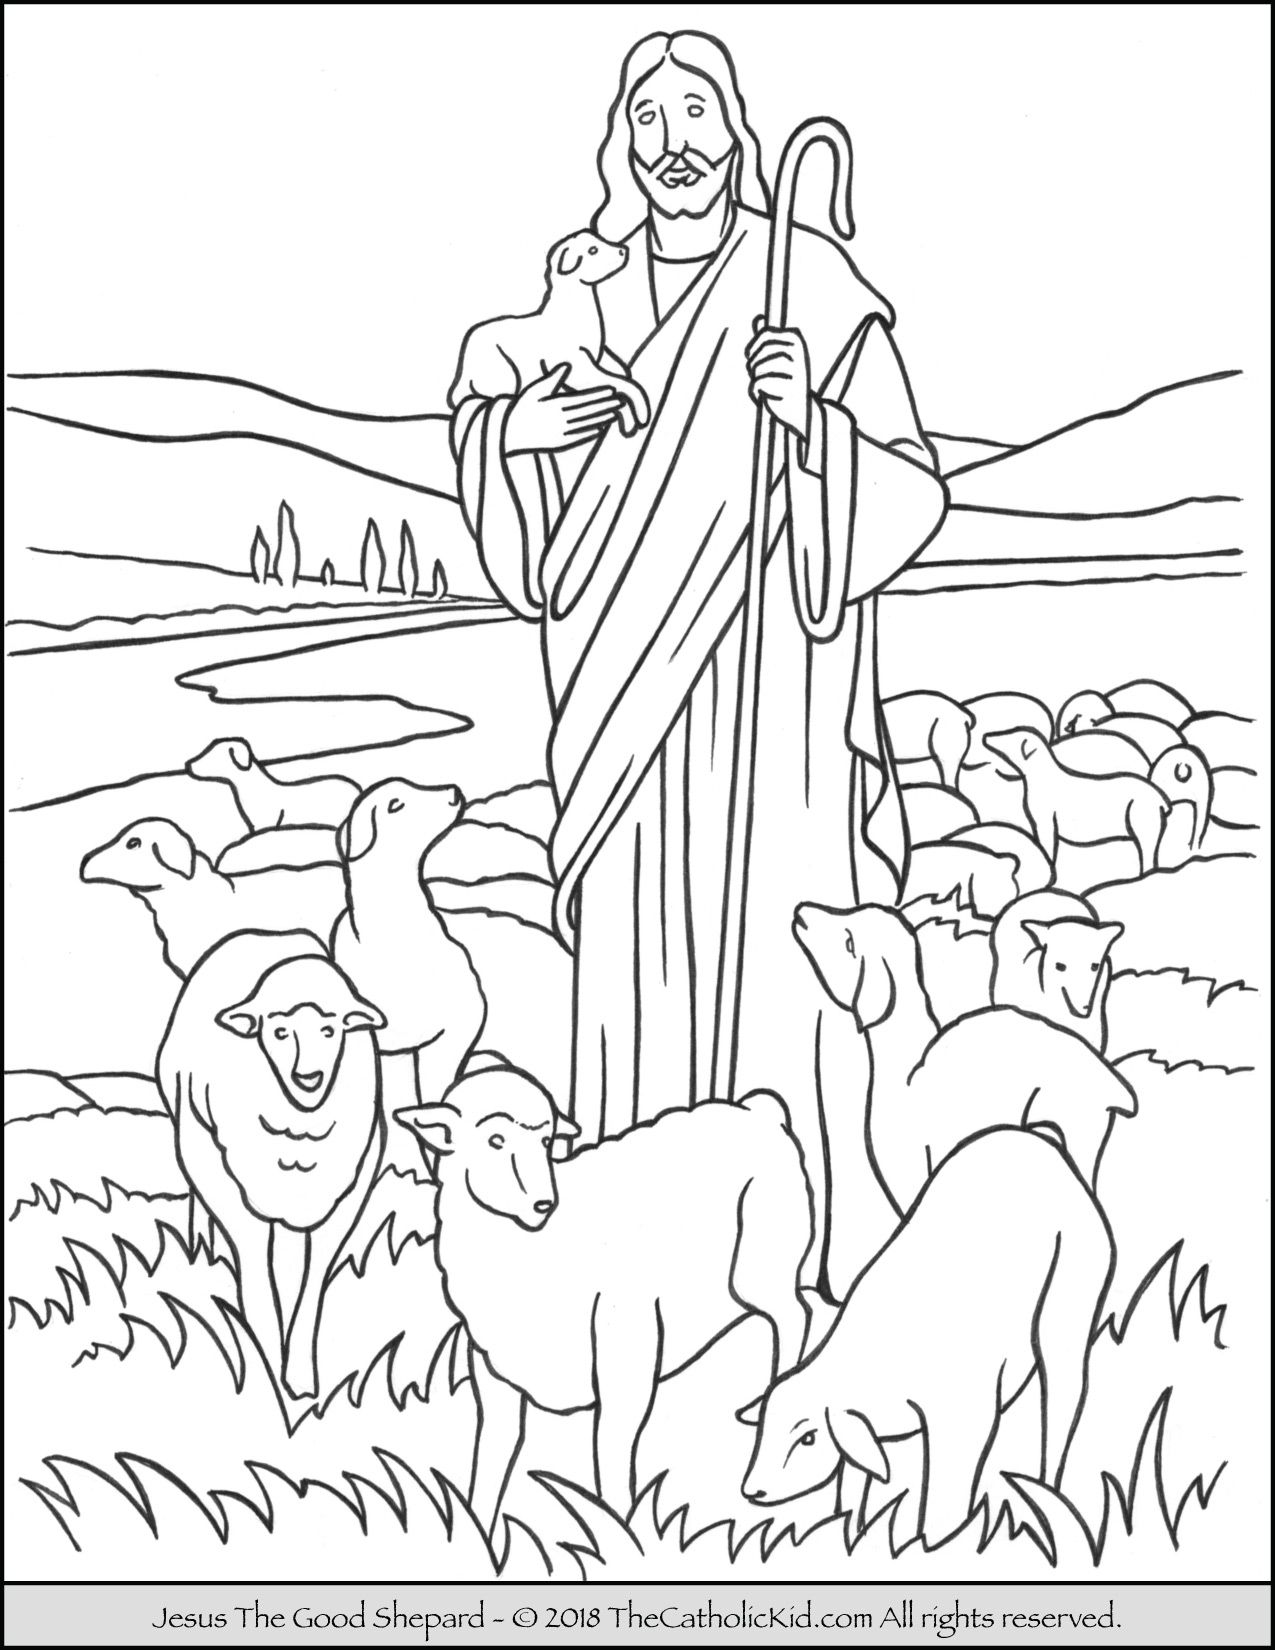 Jesus The Good Shepard Coloring Page Jesus Coloring Pages Sunday School Coloring Pages Good Shepard